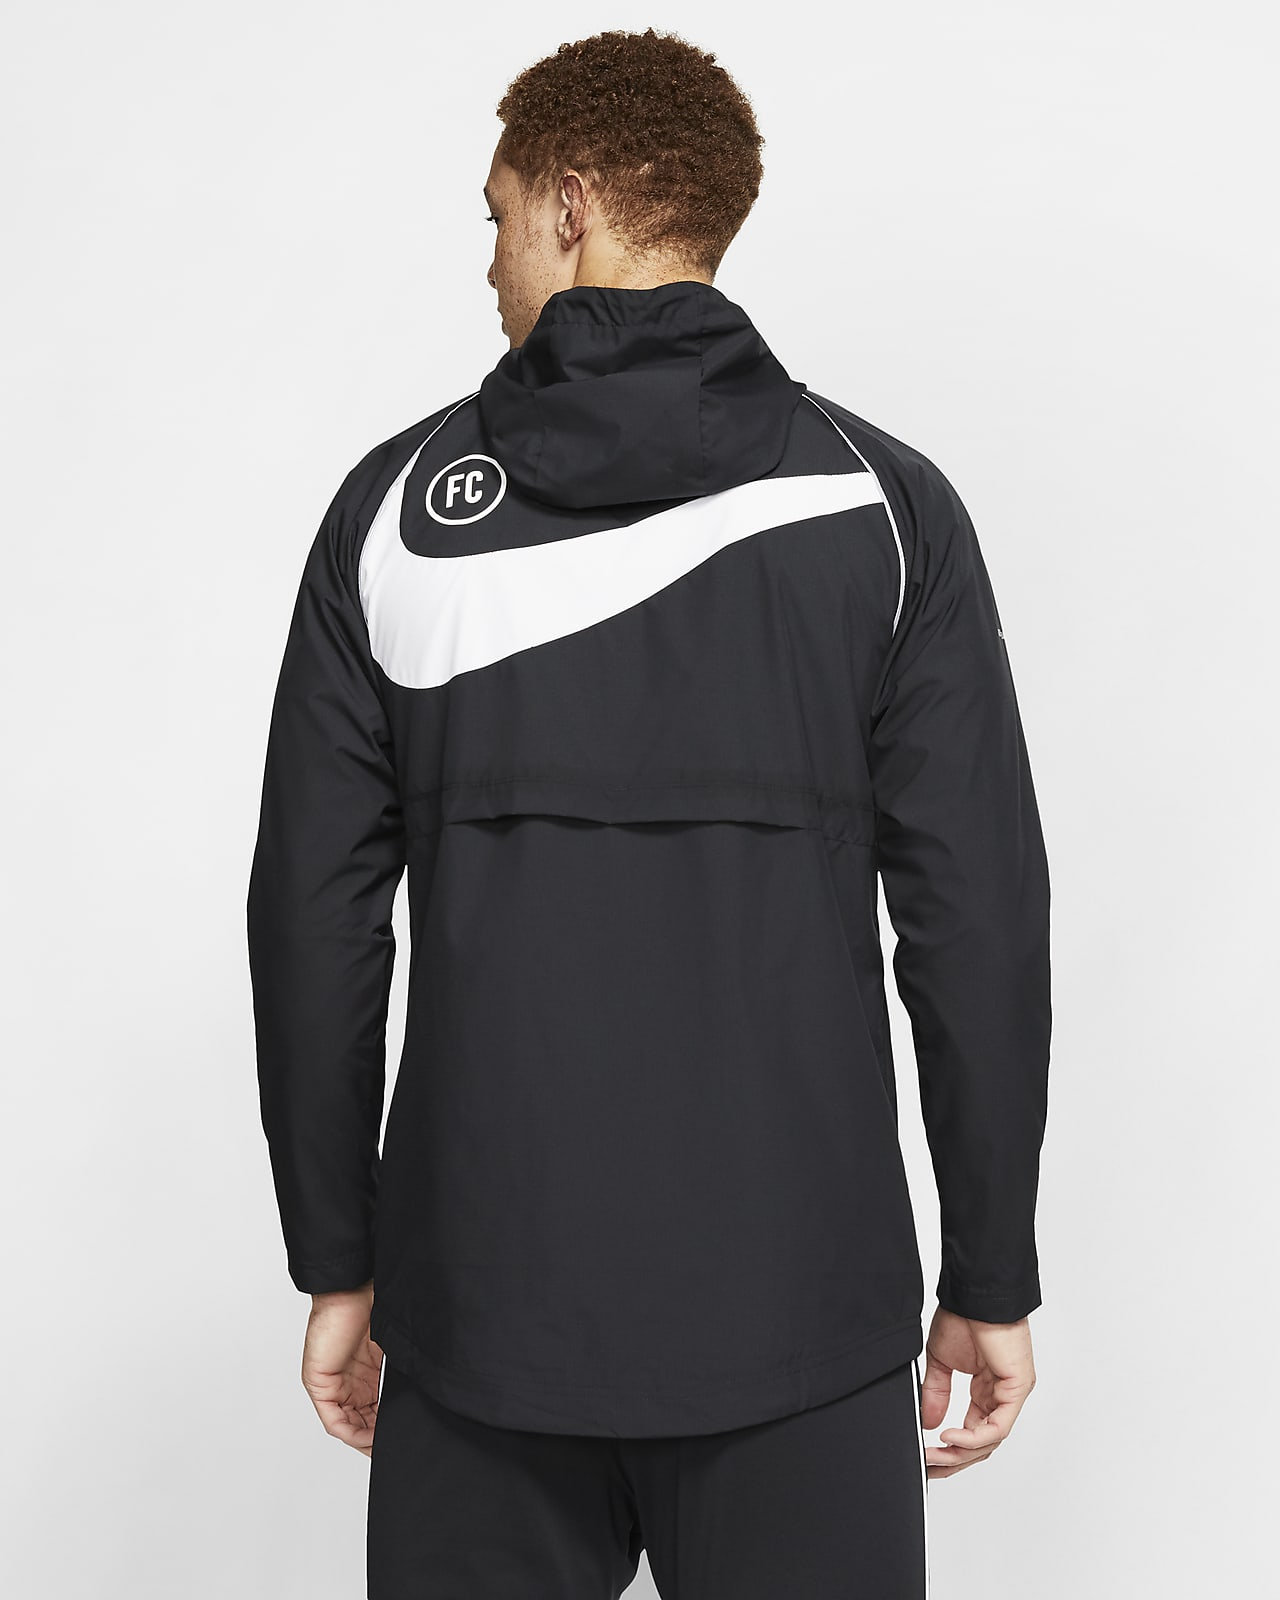 Nike F.C. Men's Football Jacket. Nike NO